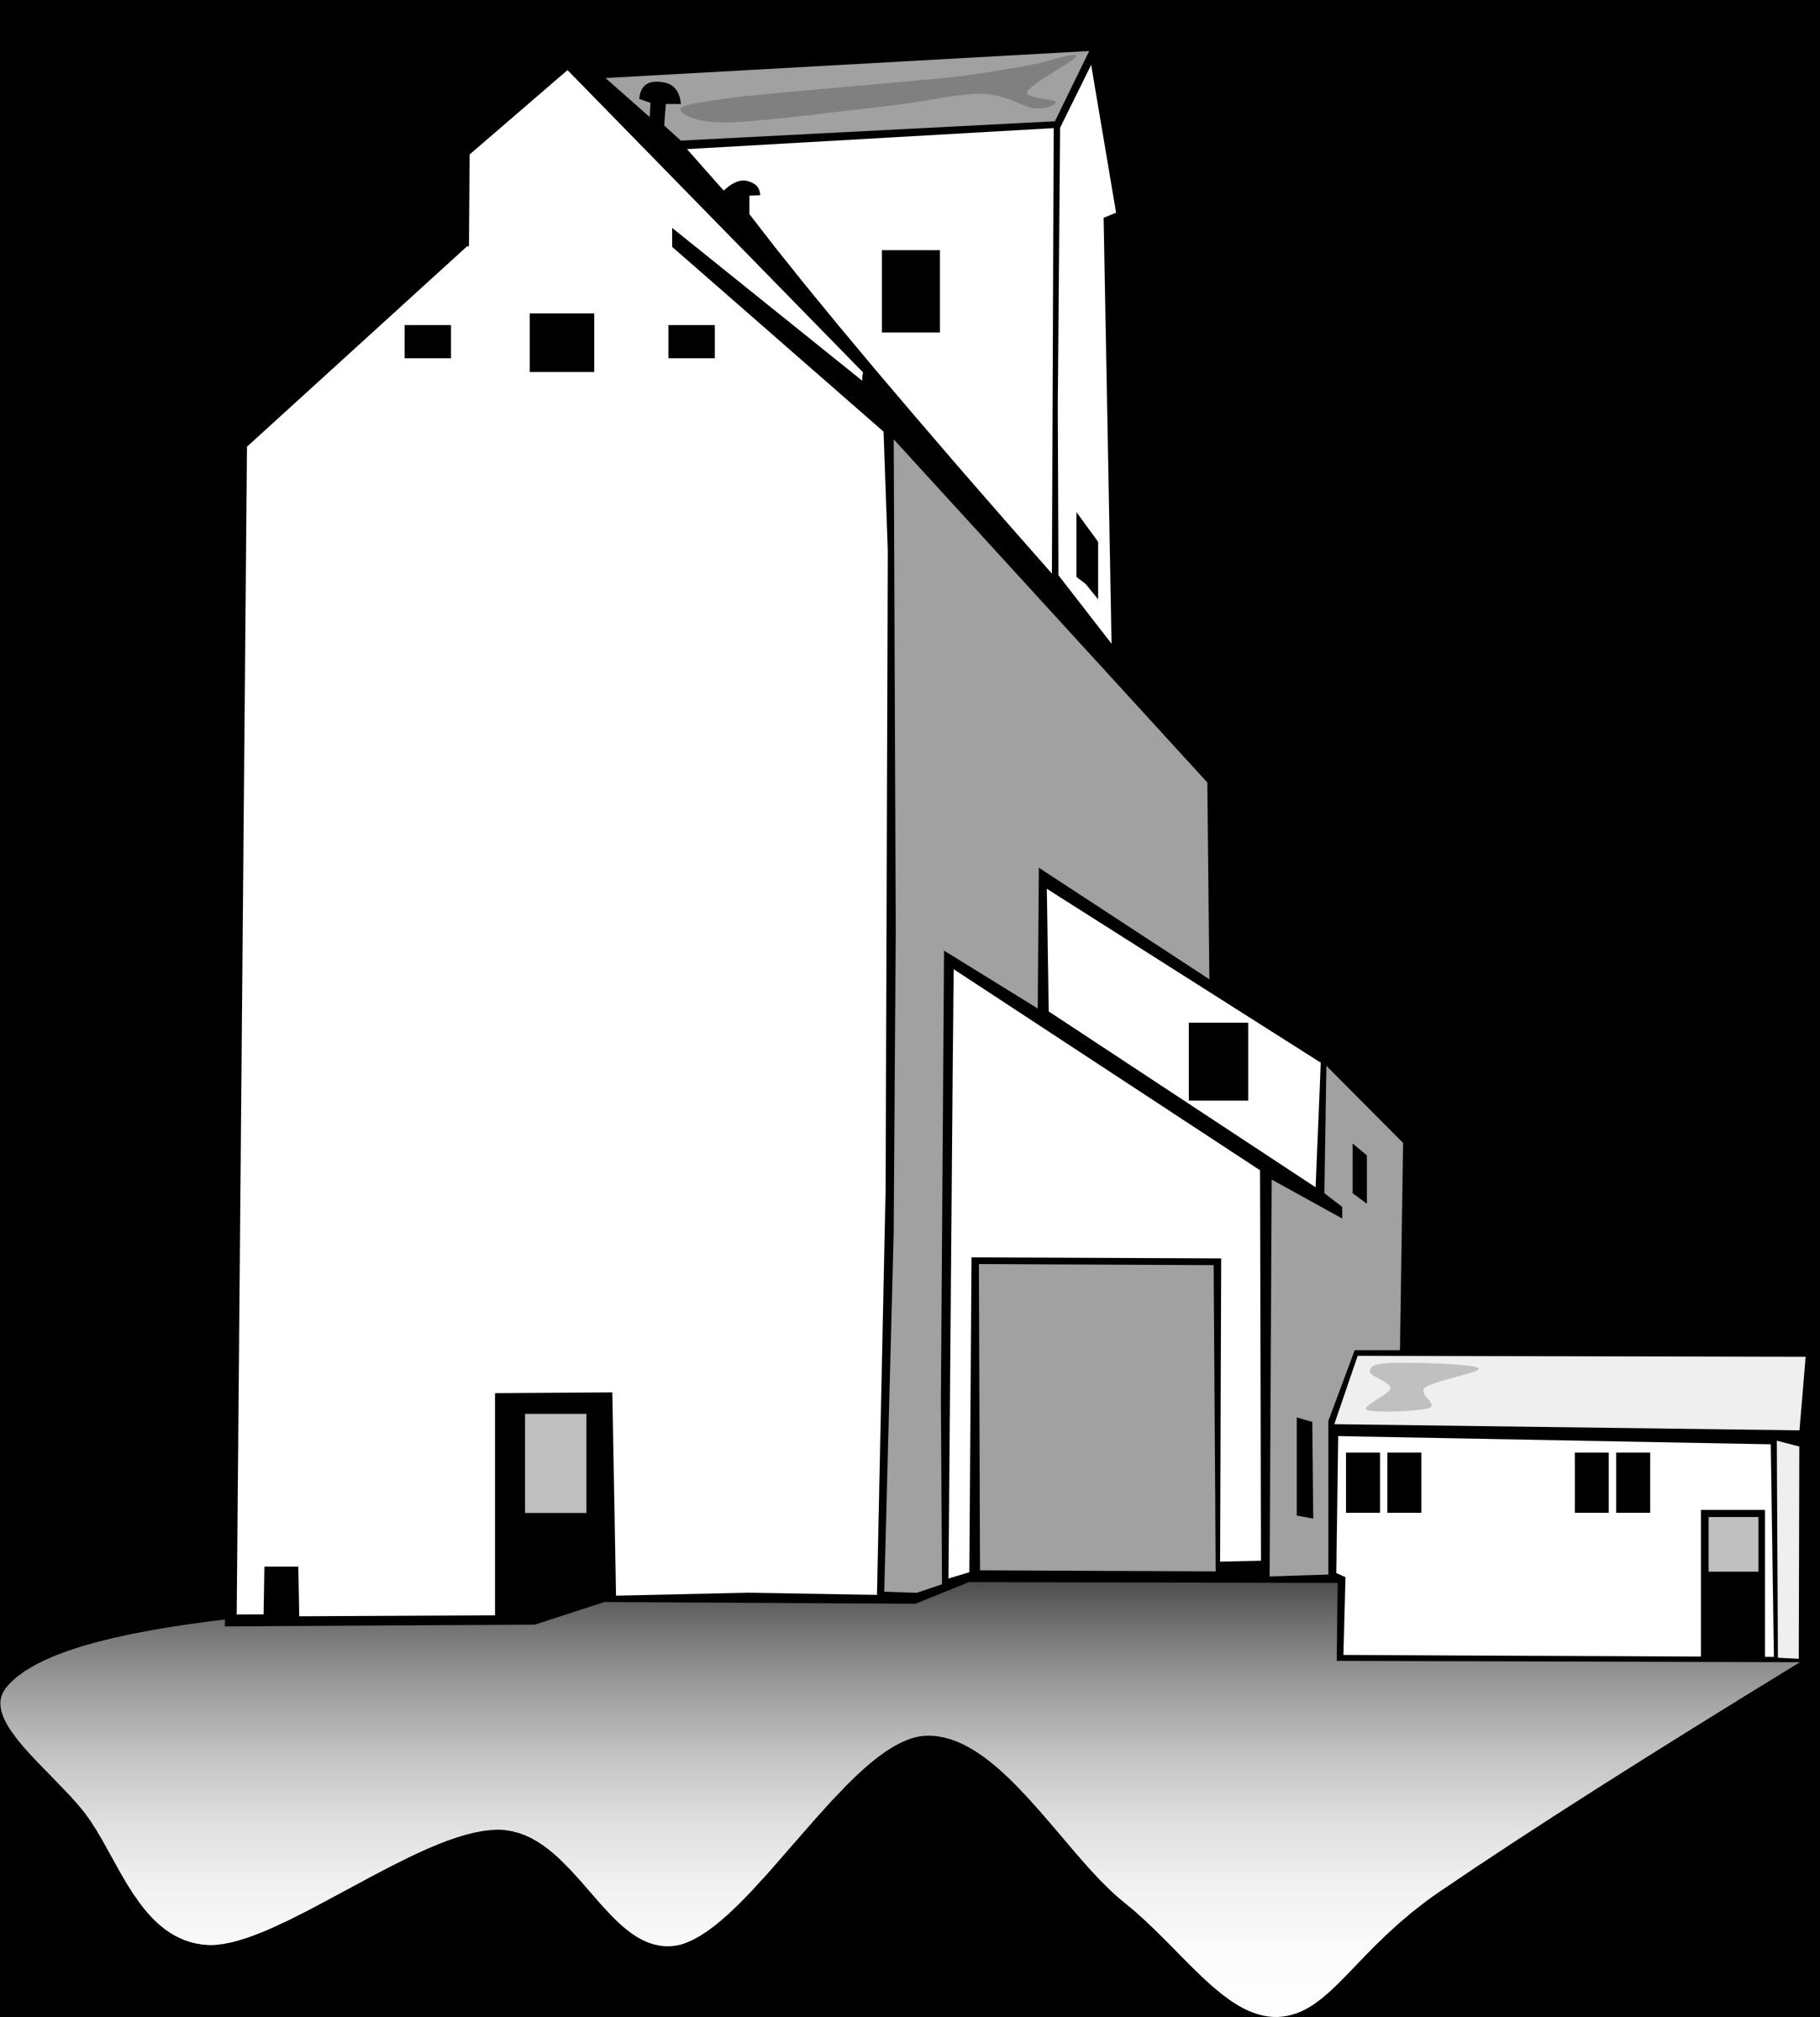 The highest grain silo clipart #17